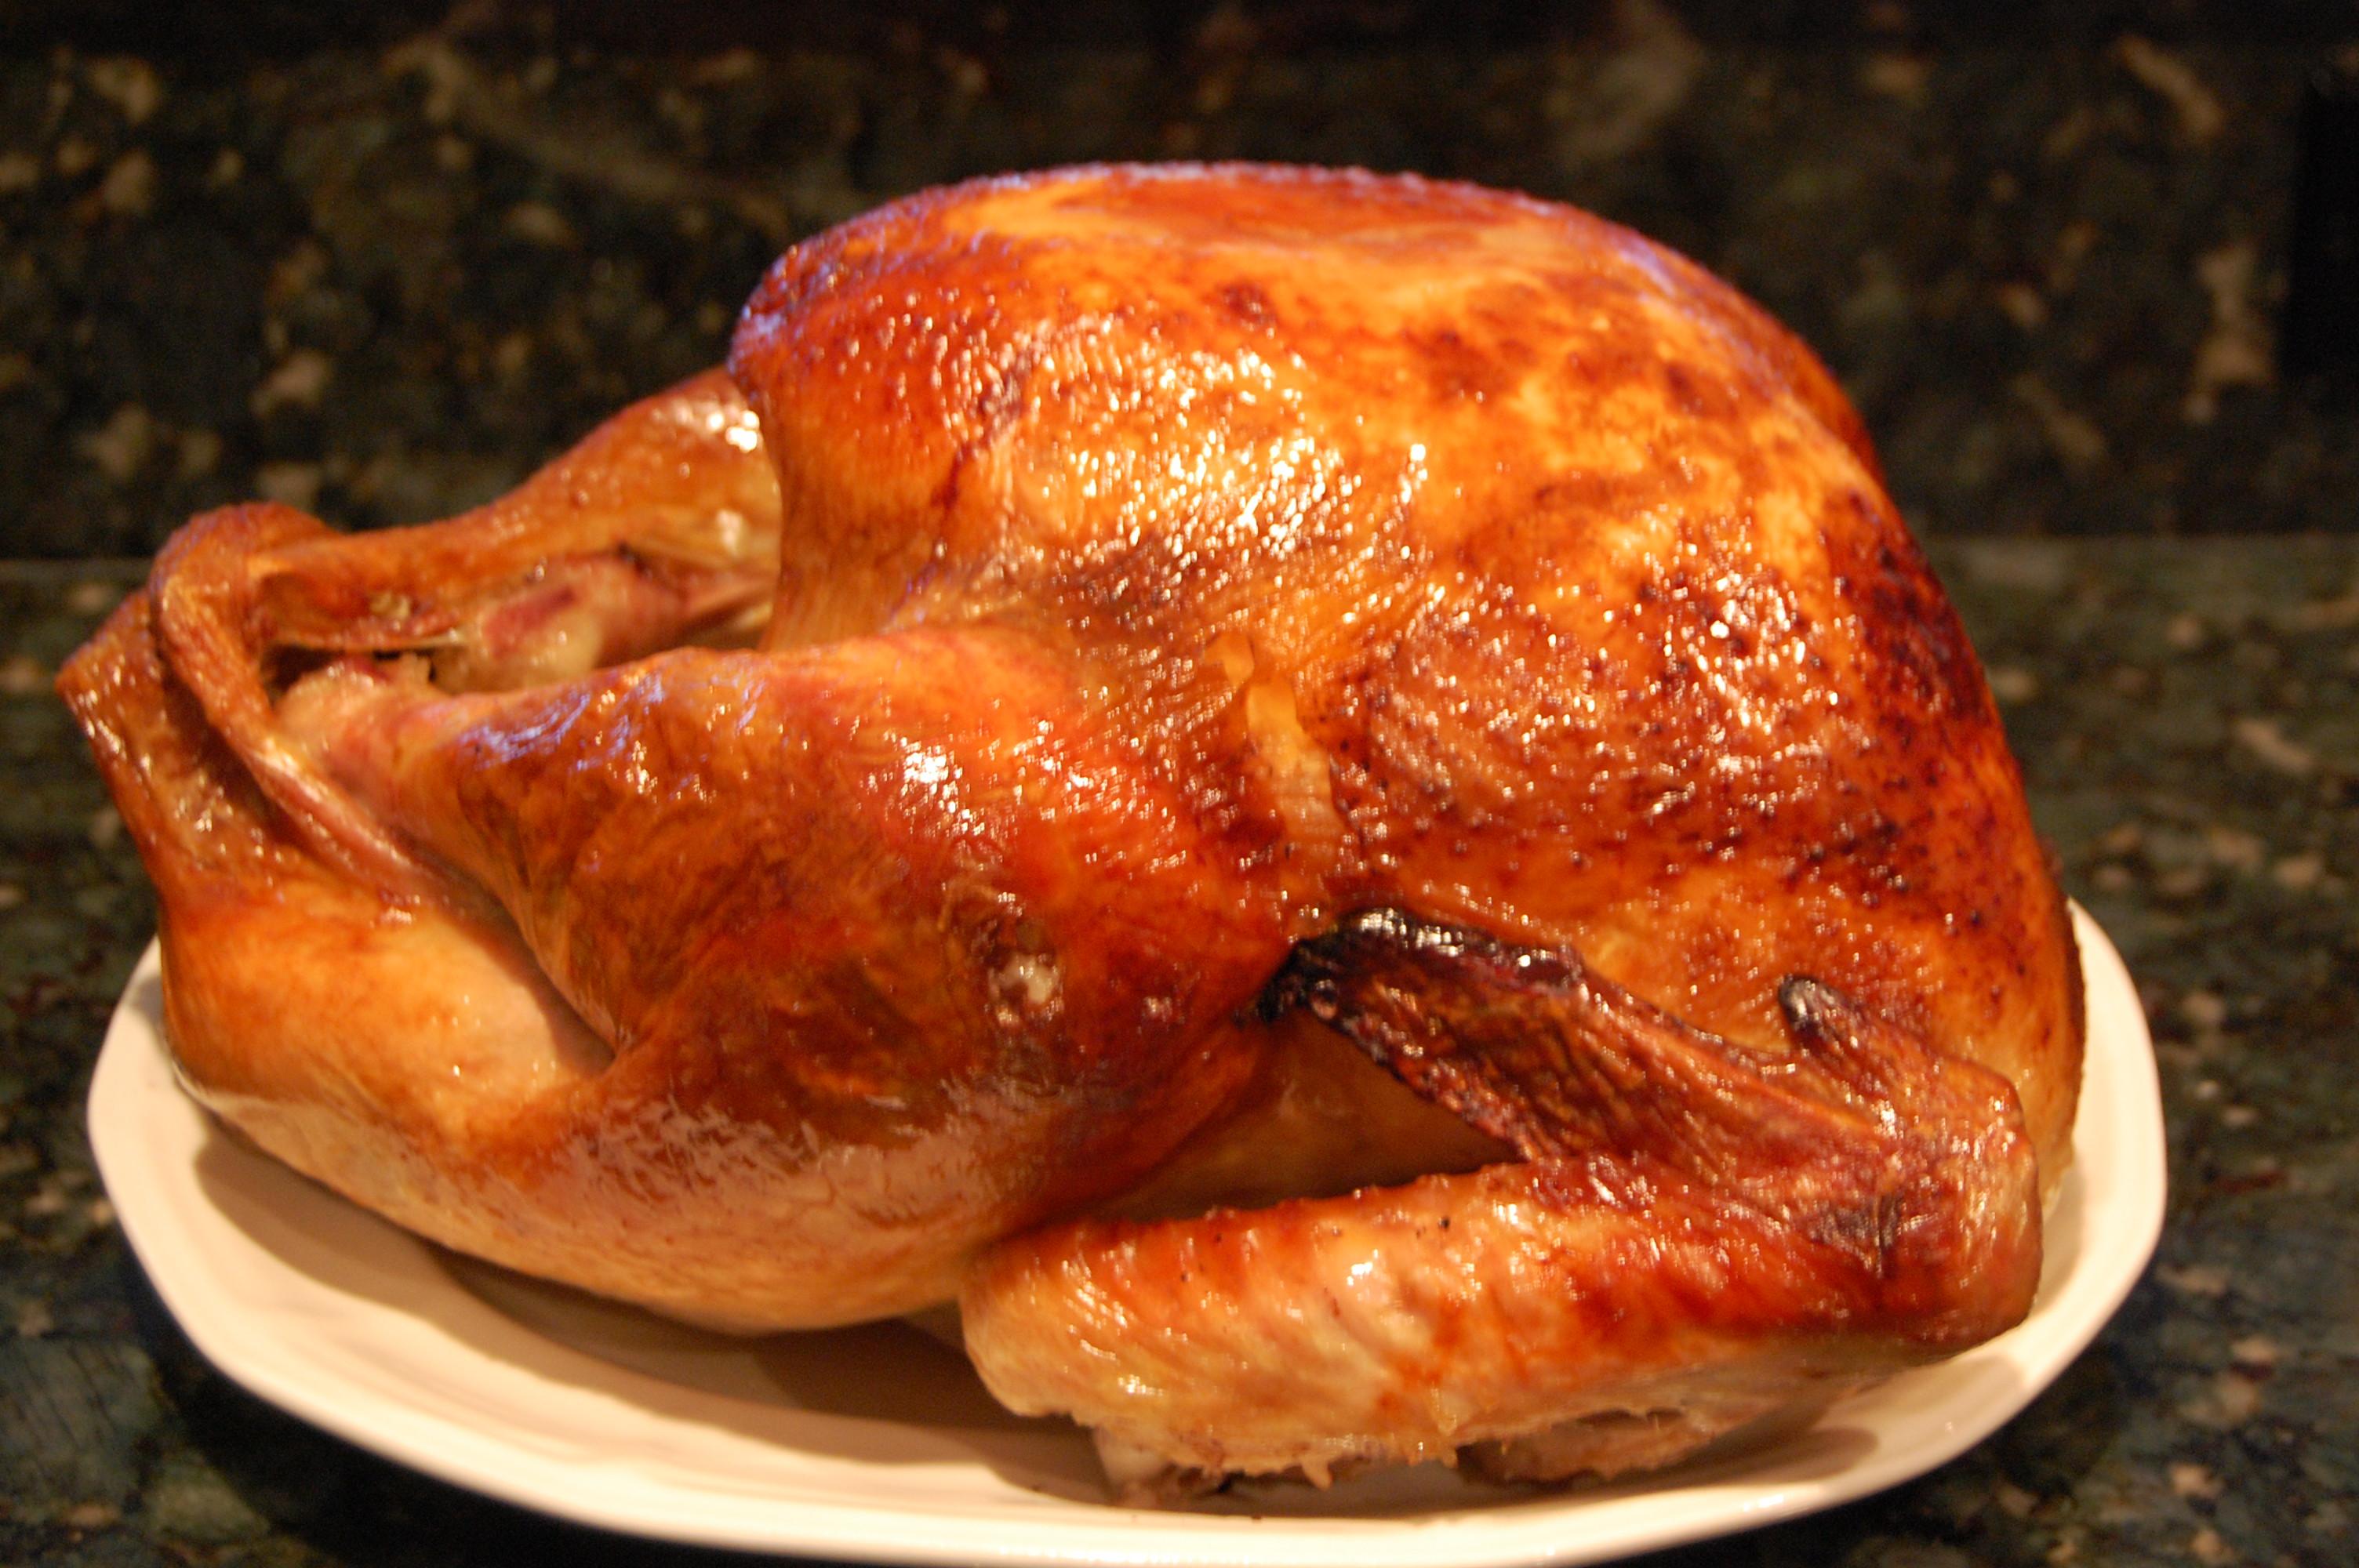 Roasted Turkey | The Teacher Cooks